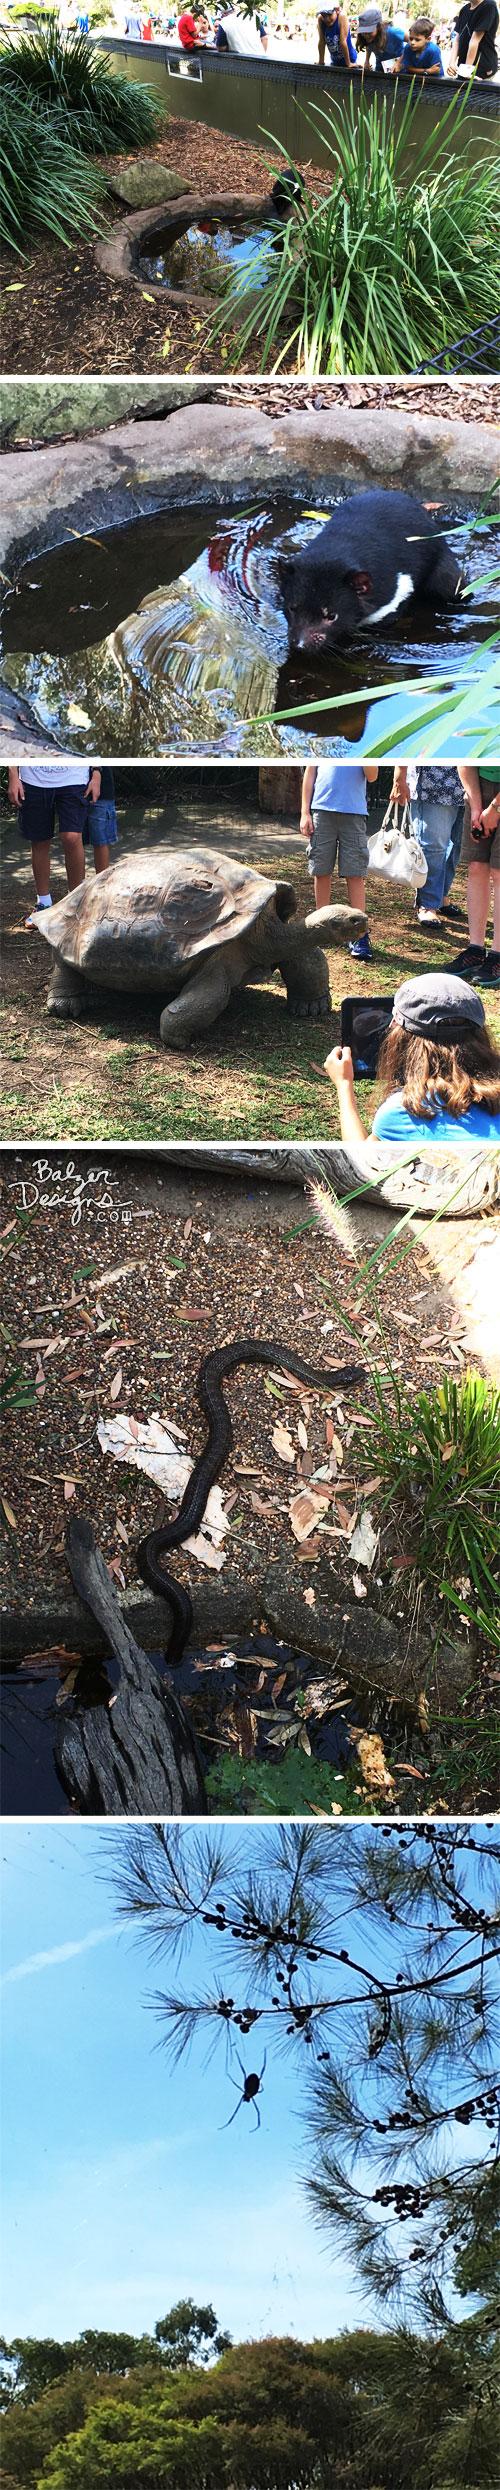 From the Balzer Designs Blog: Australian Reptile Park